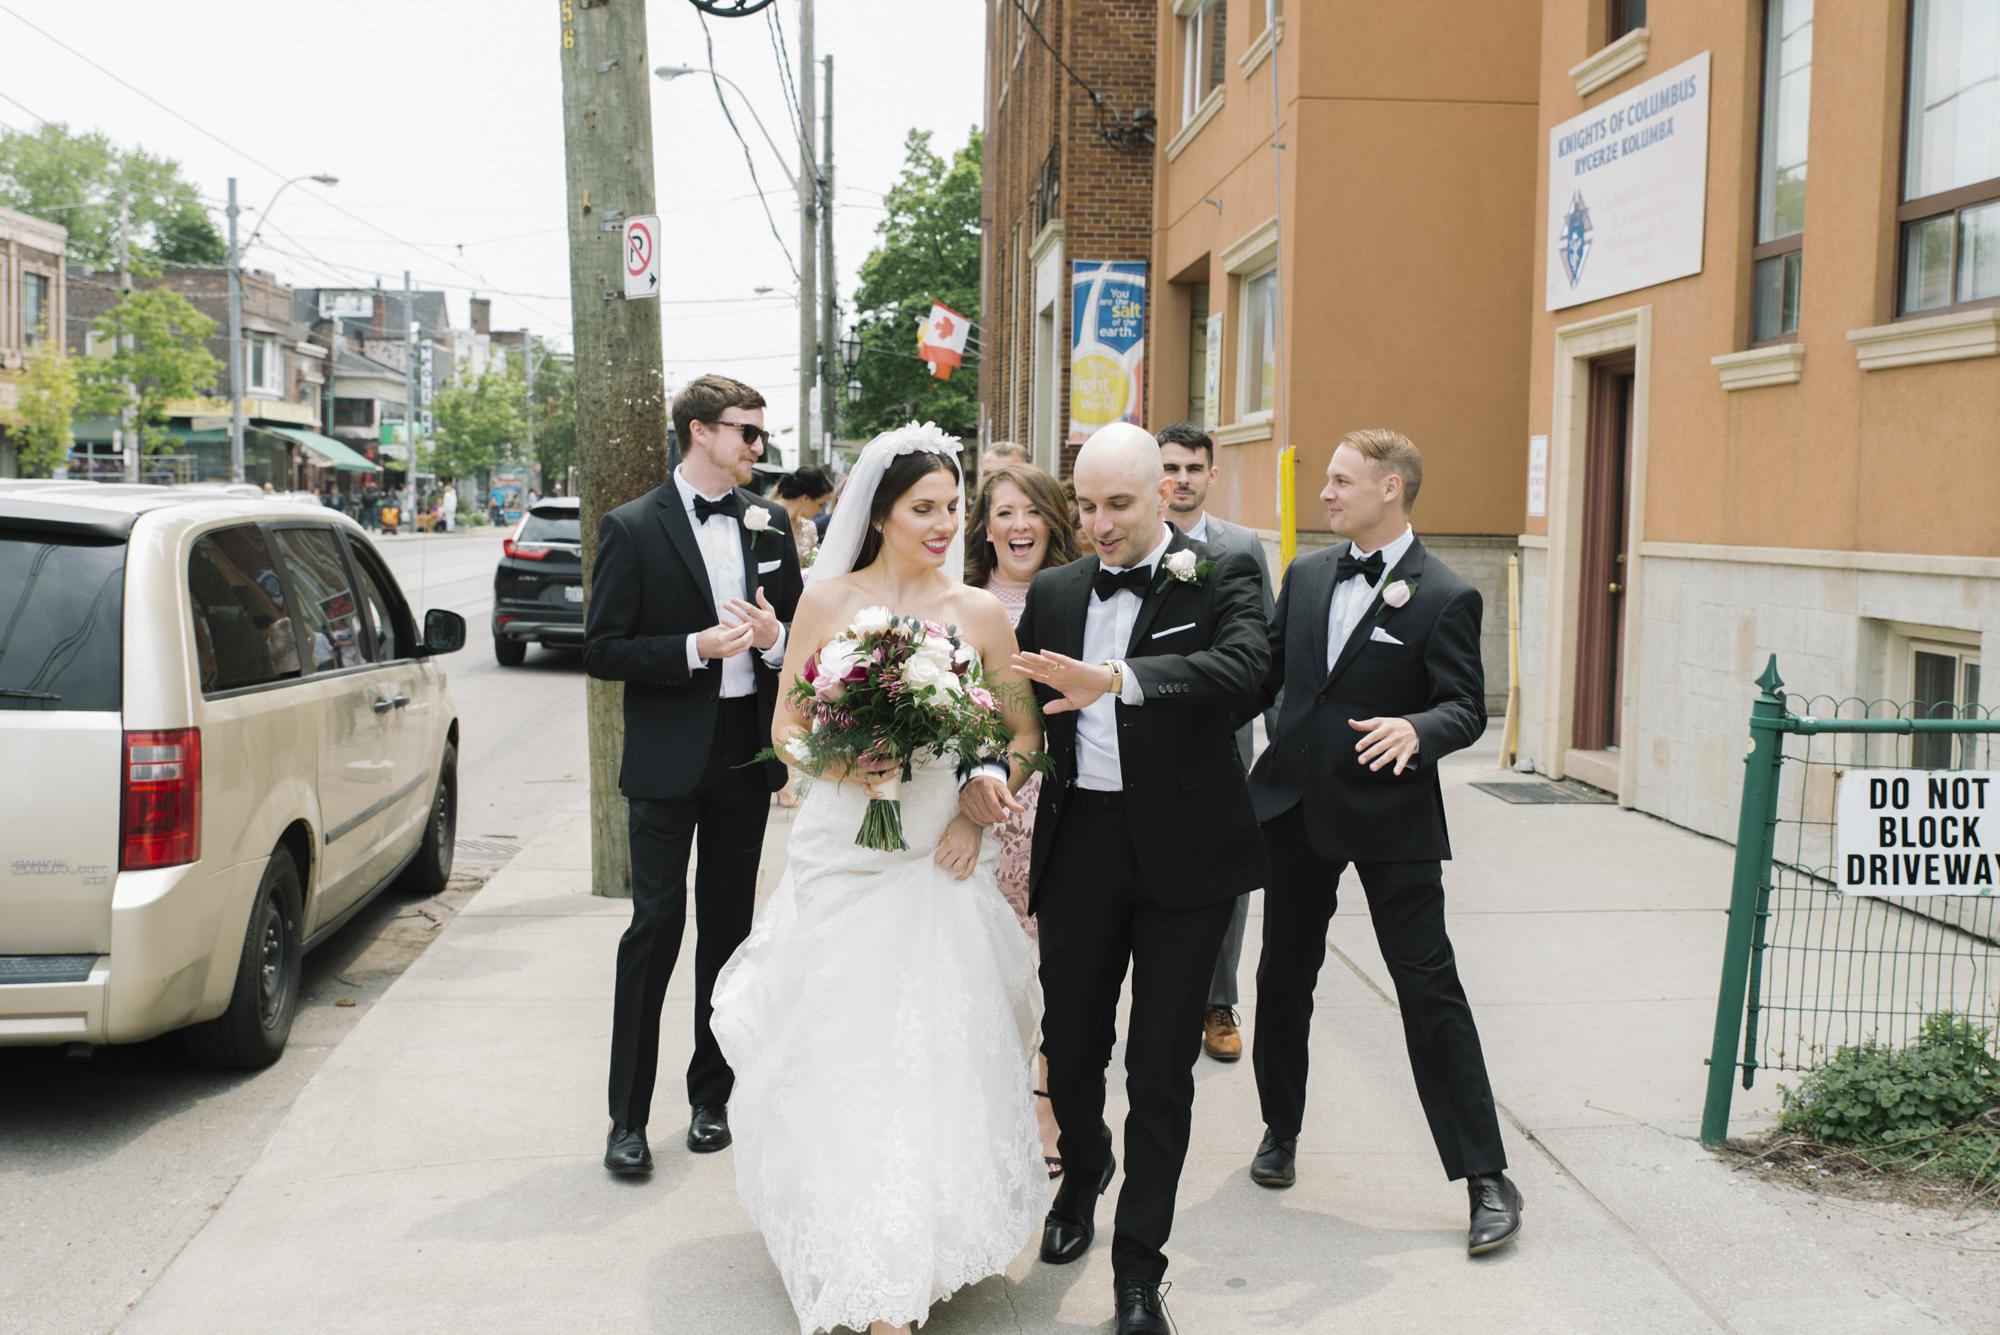 RosewoodWeddingPhotos-Roncesvalles-TorontoWeddingPhotographer-PolishWedding-KarenAlex-TorontoWedding-52.JPG